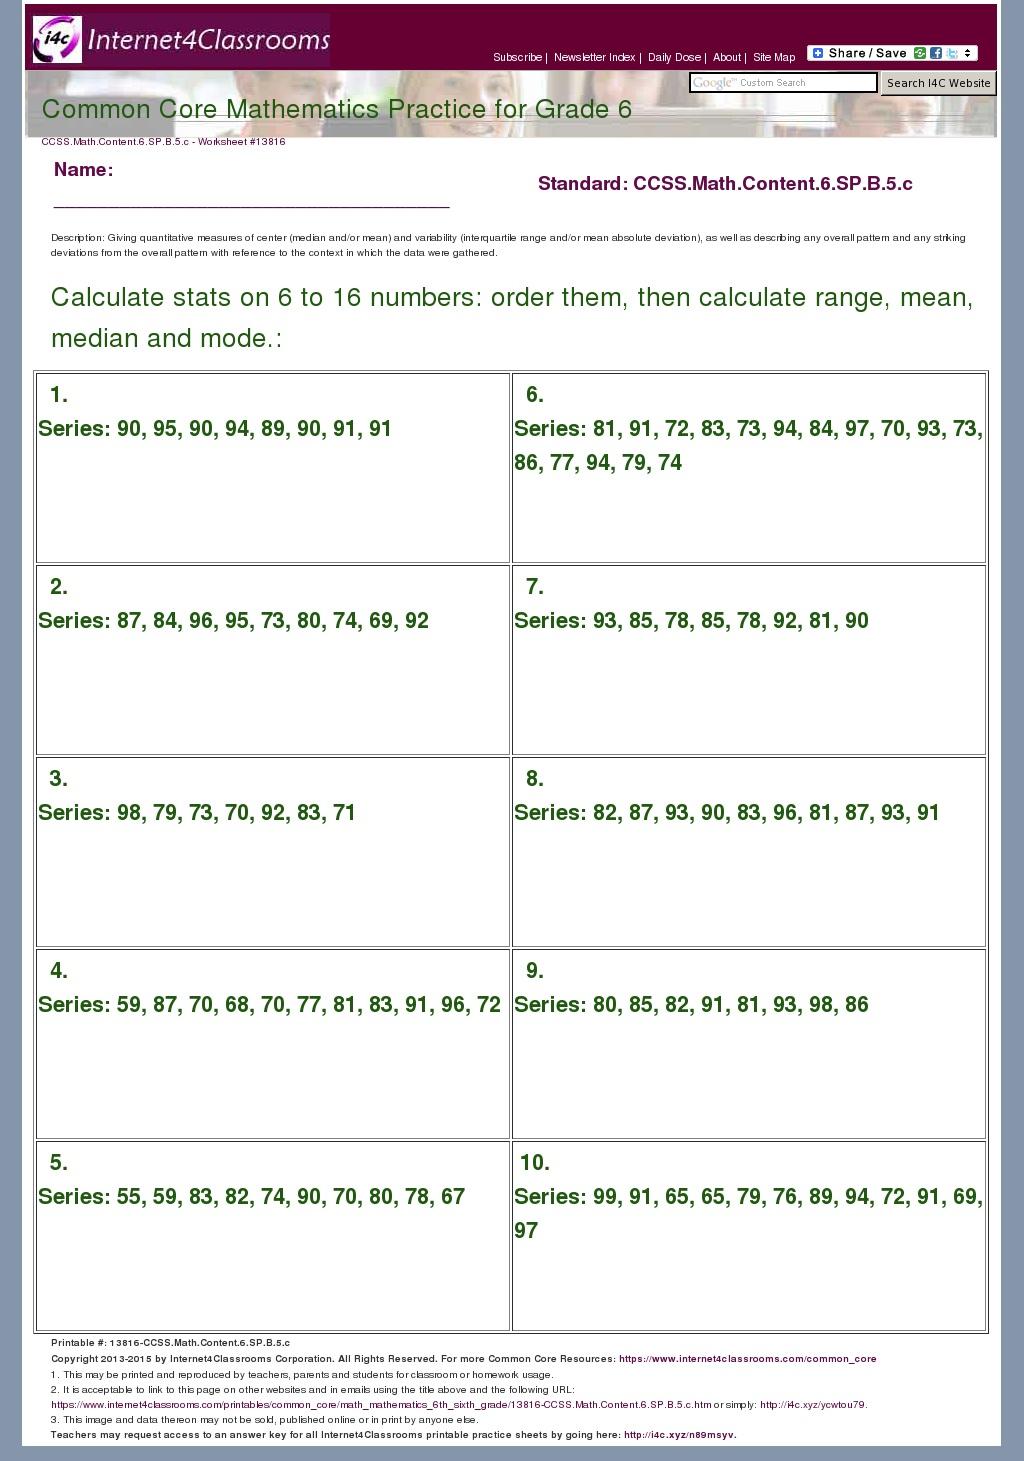 Description/Download - Worksheet #13816. CCSS.Math.Content ...